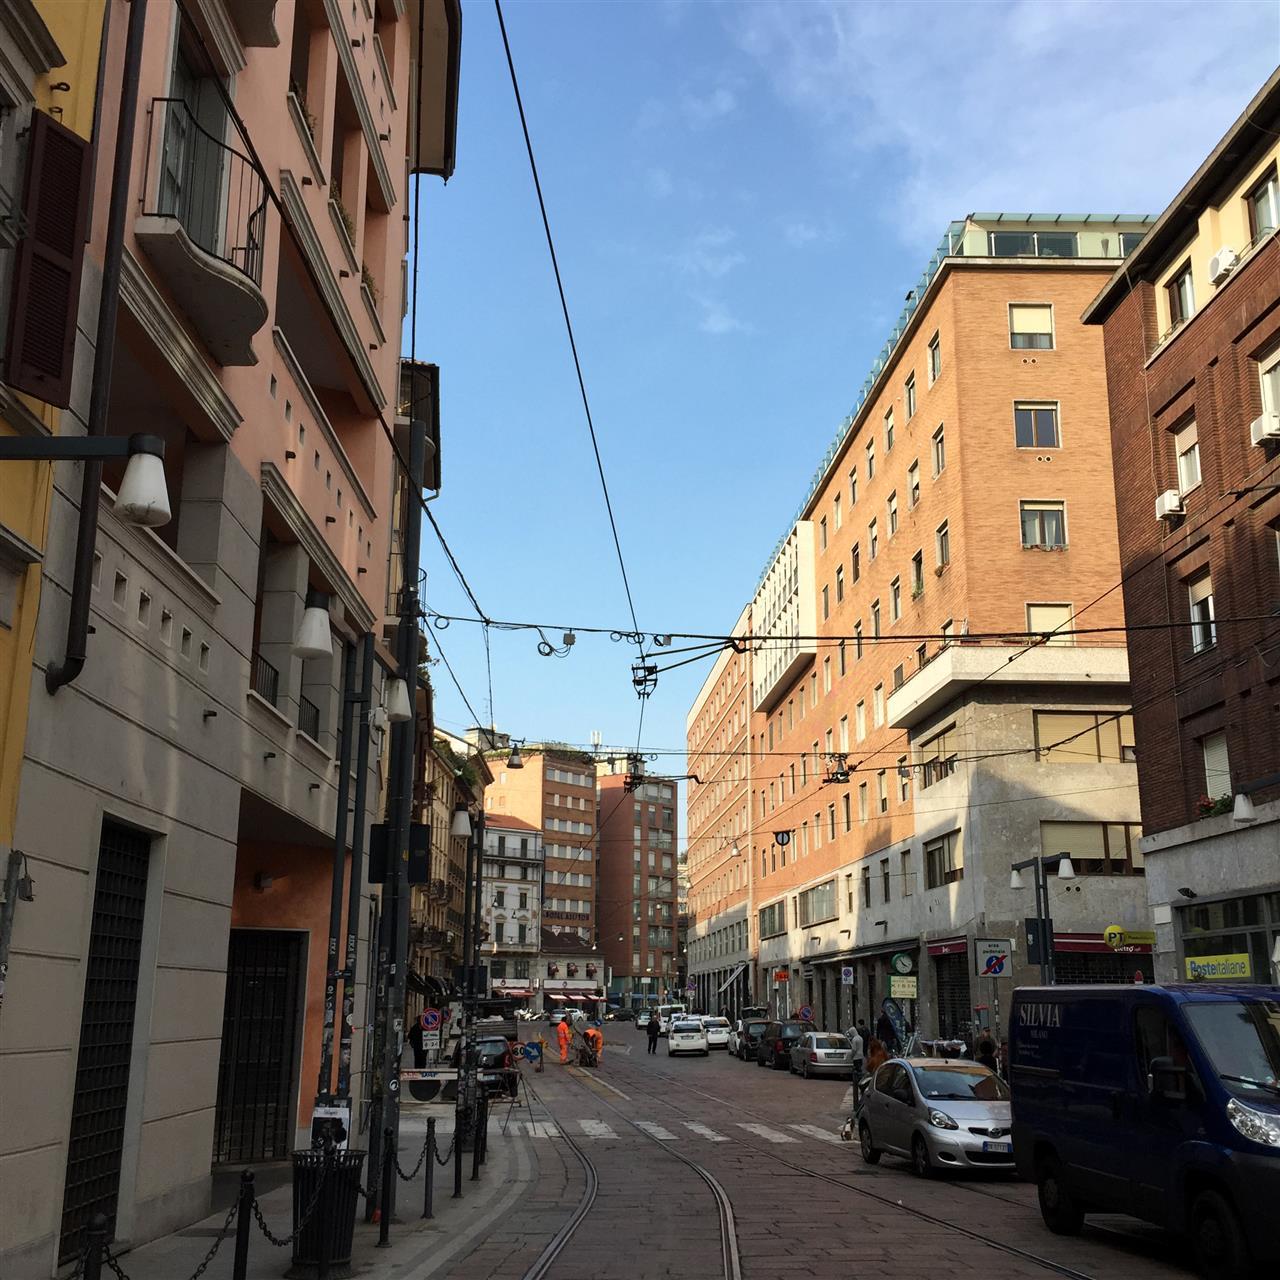 #ColonnediSanLorenzo #Milano